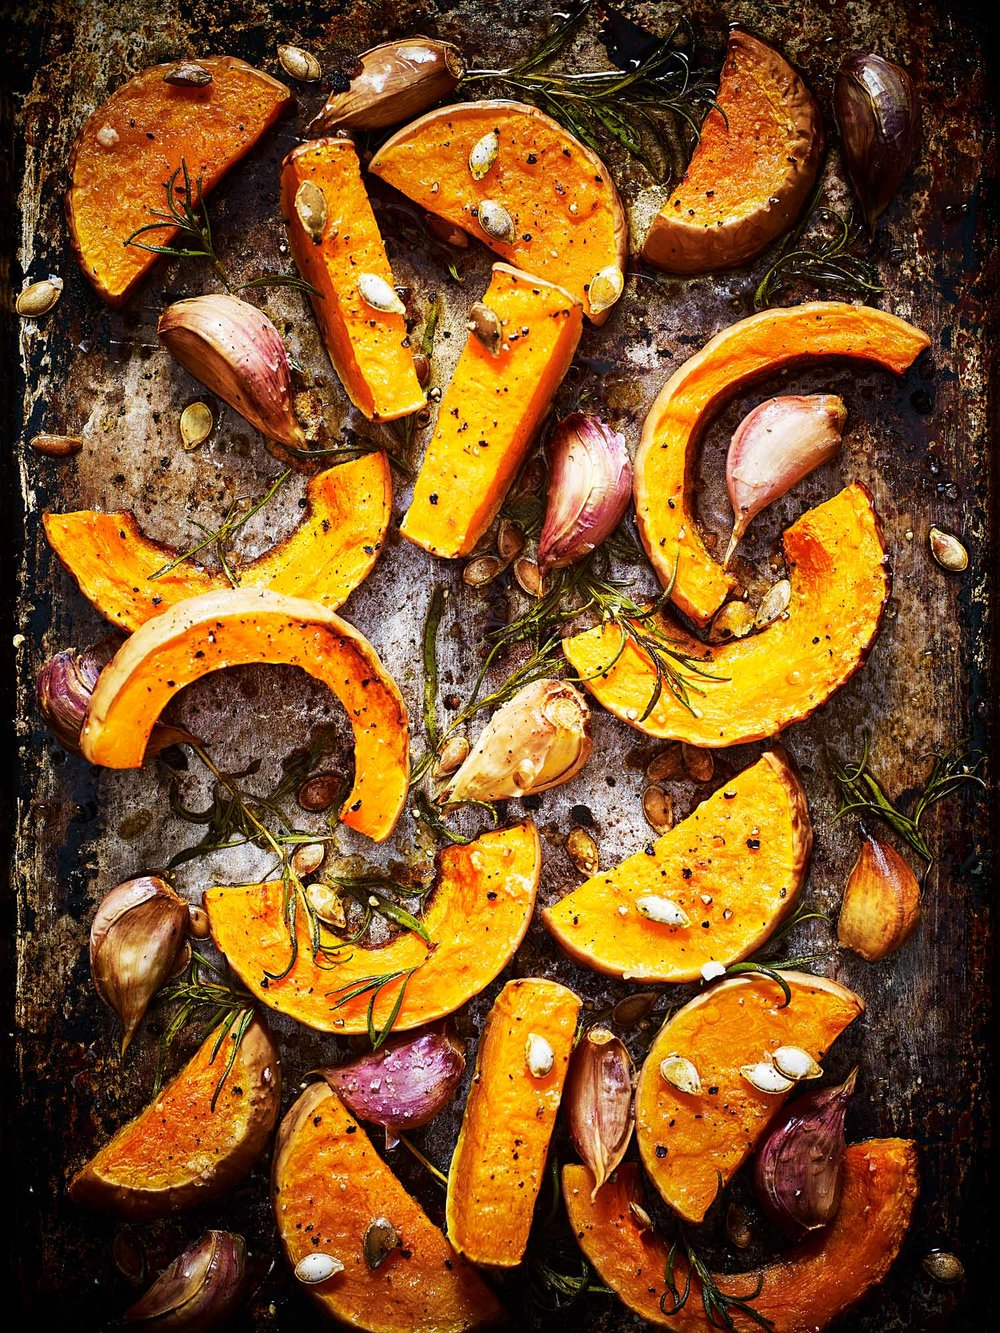 Stuart West - roasted vegetables